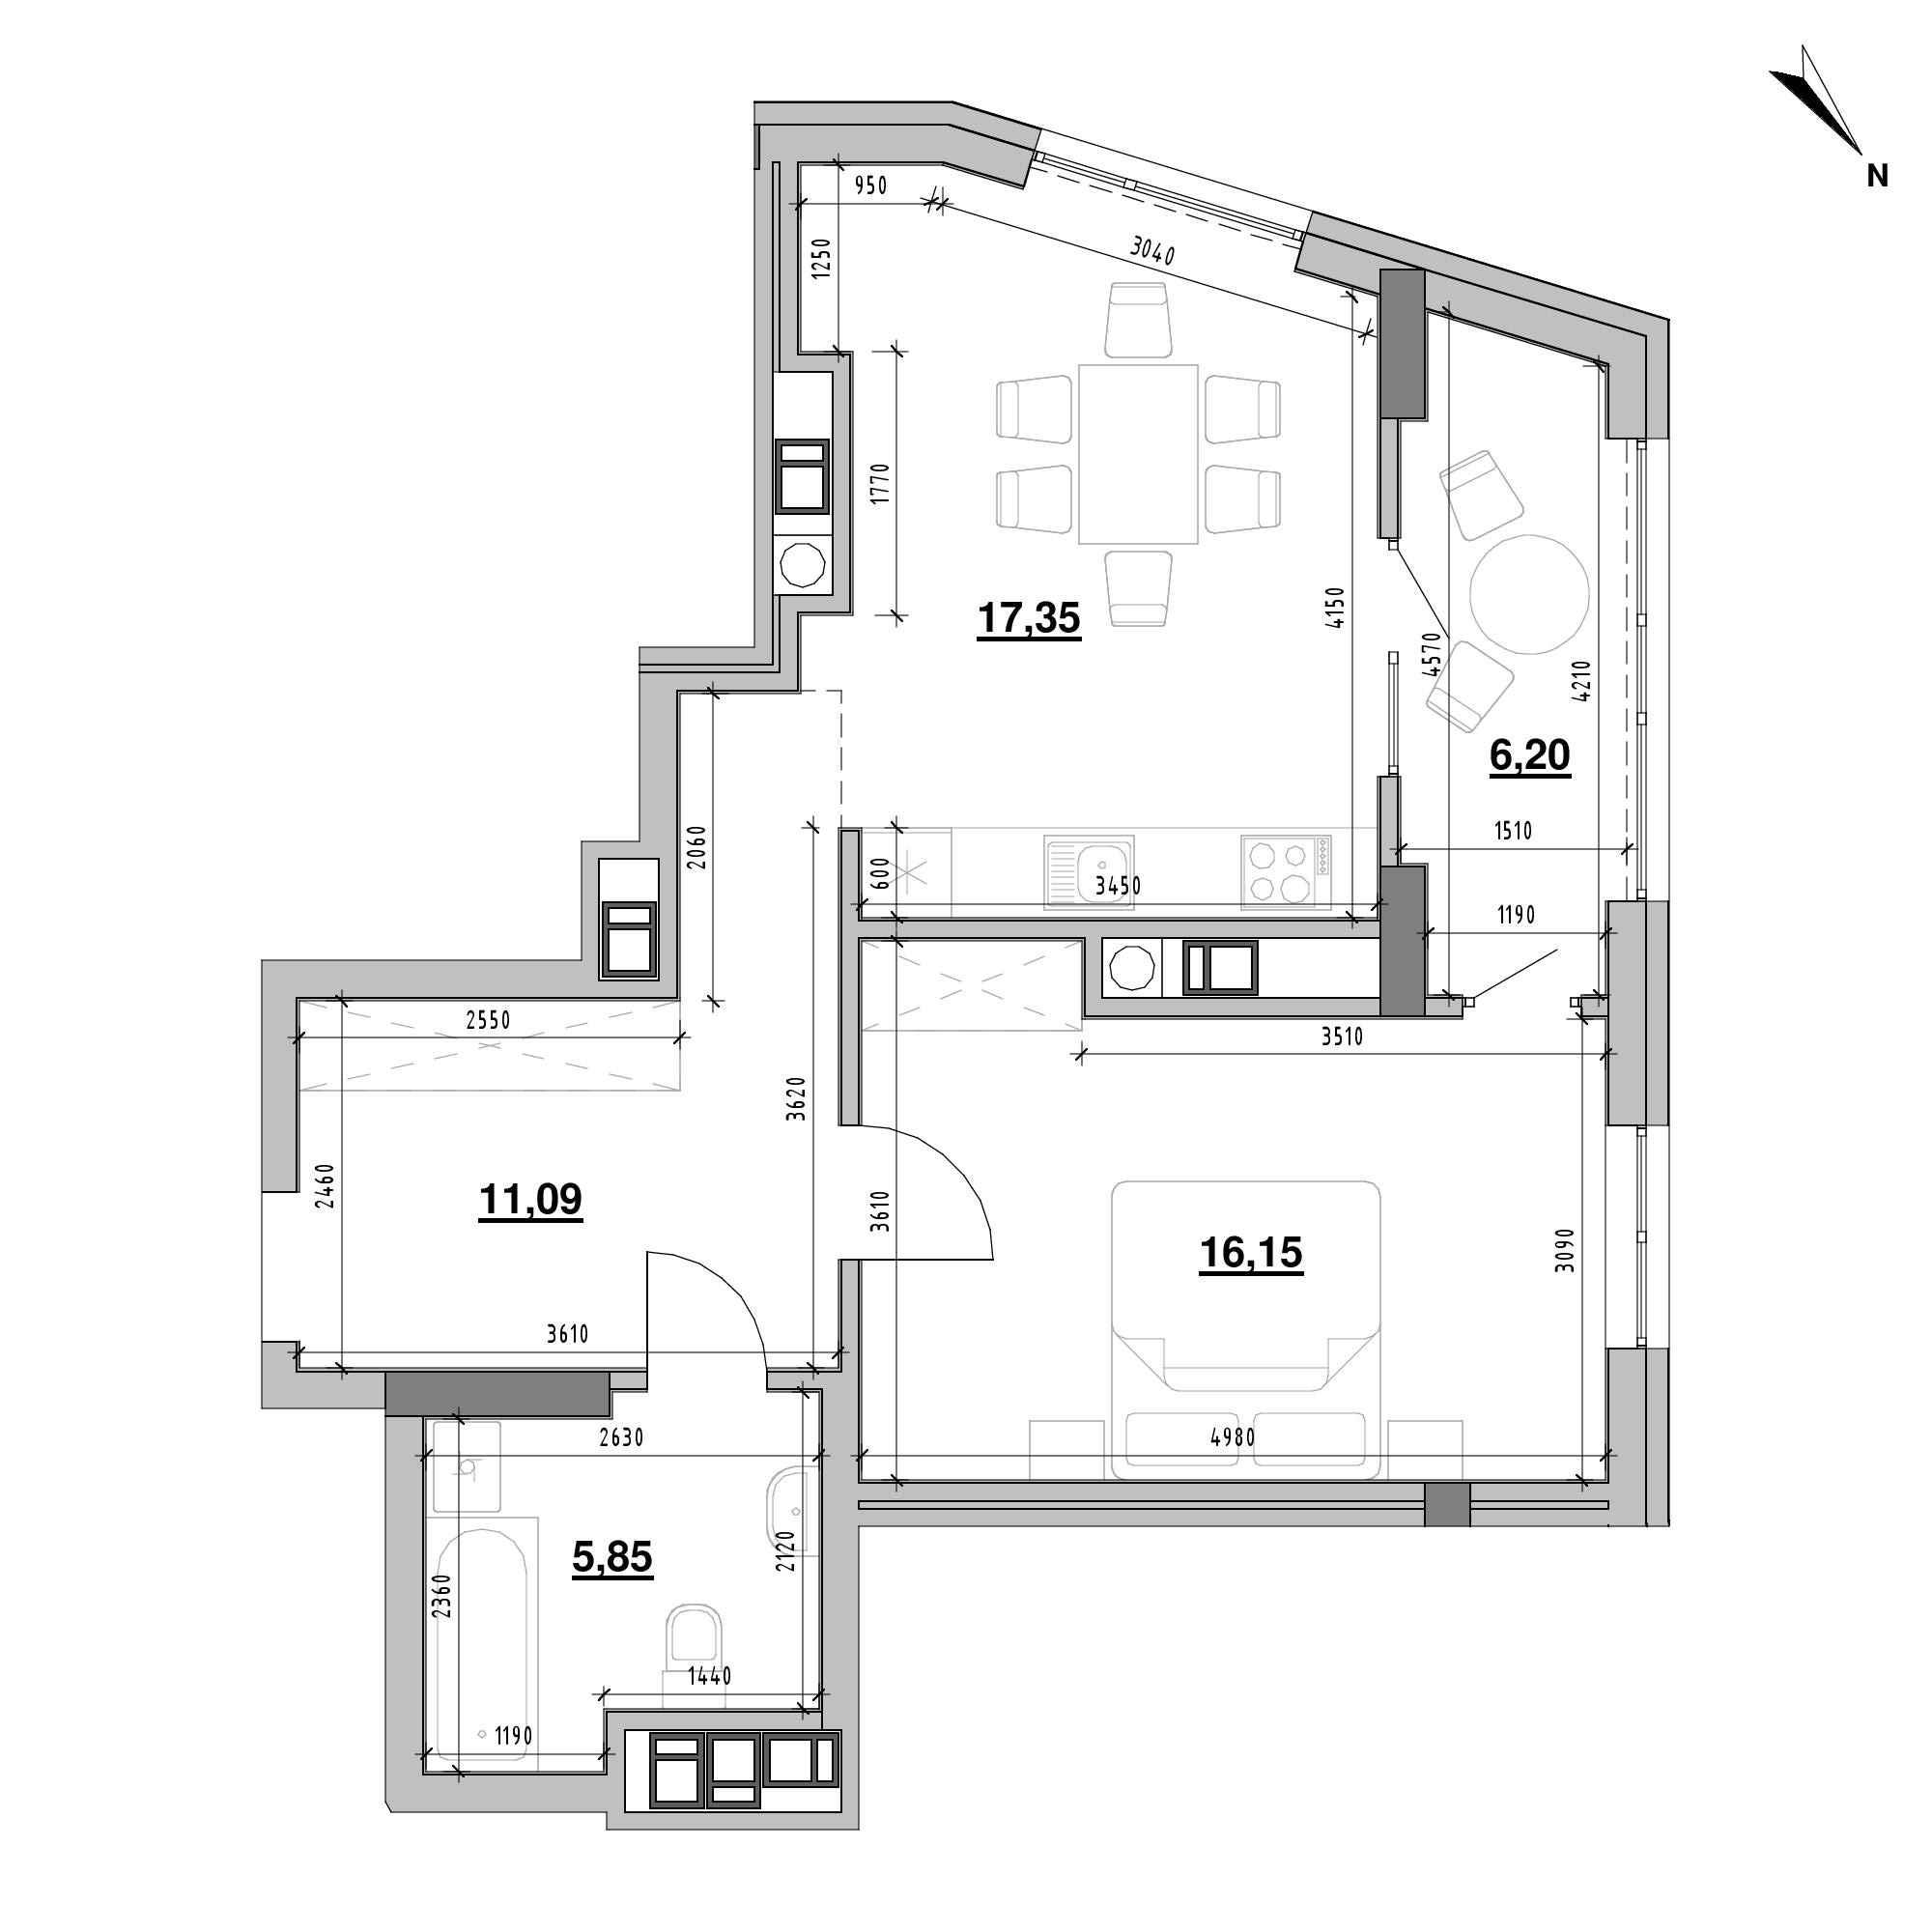 ЖК Ярославенка: планування 1-кімнатної квартири, №16, 56.64 м<sup>2</sup>